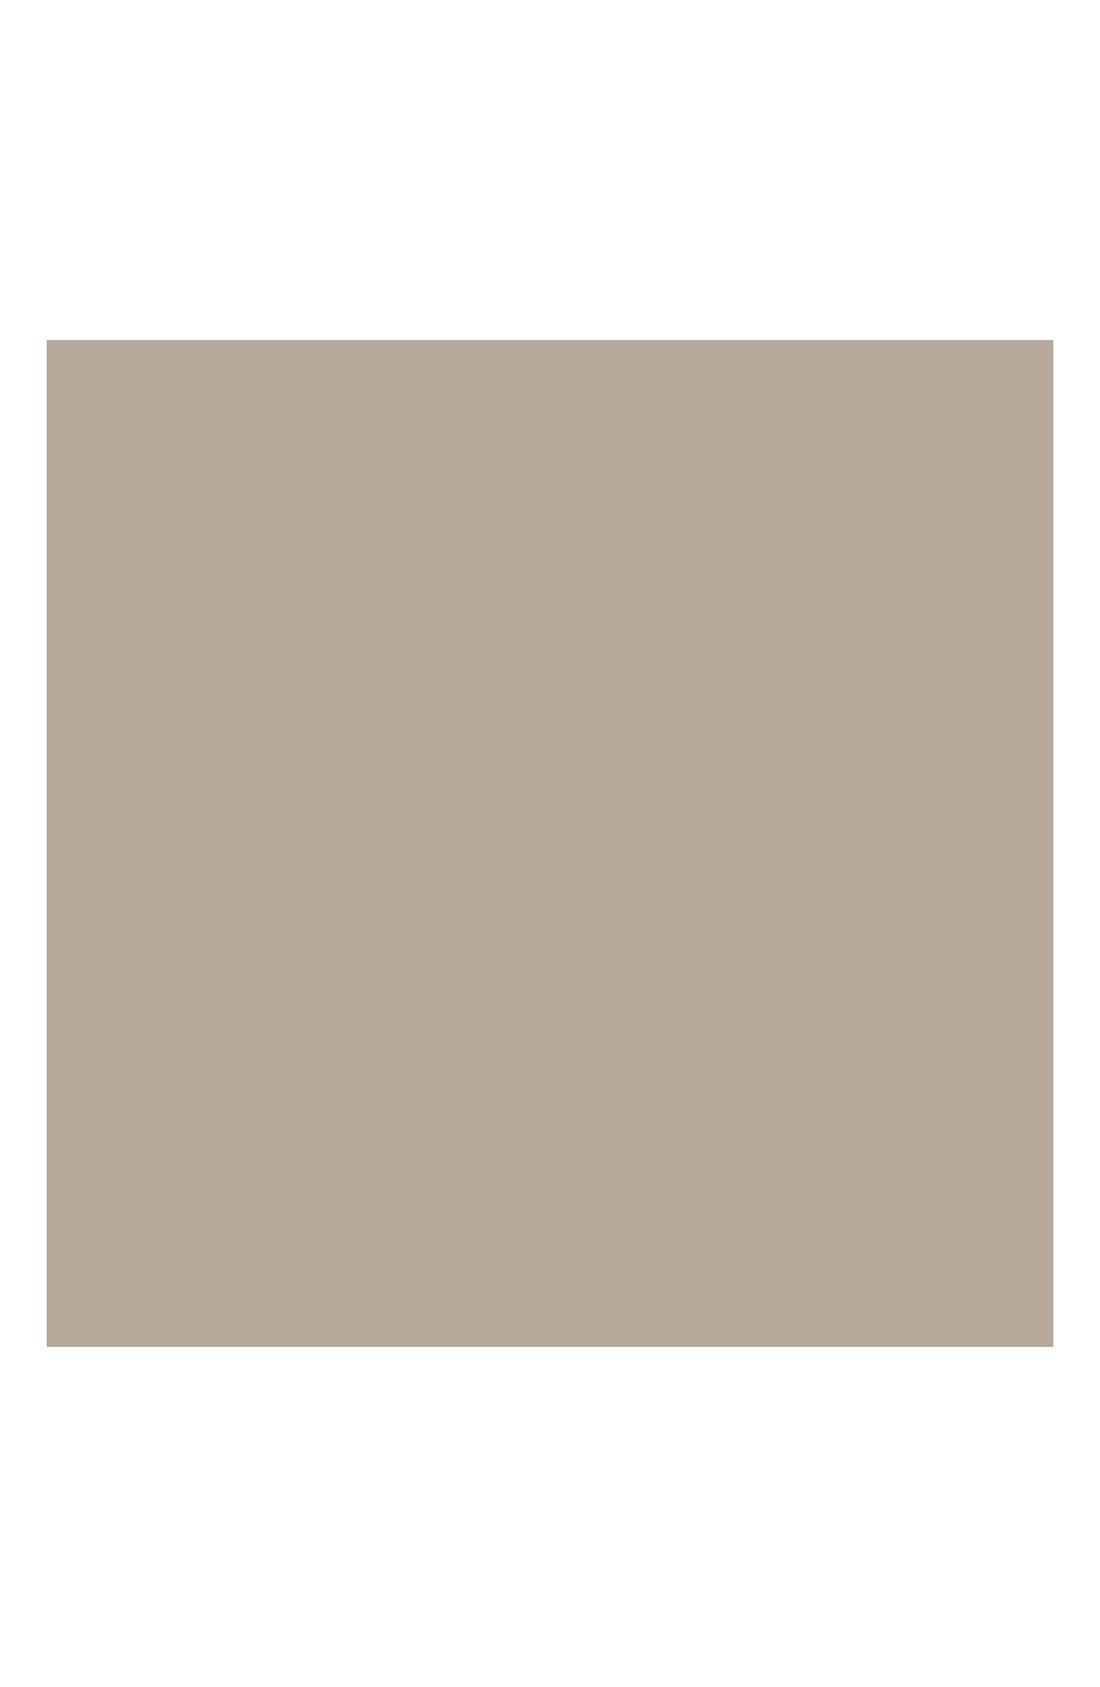 Alternate Image 3  - Wallpops 'Zoe & Pebble Blox' Wall Art